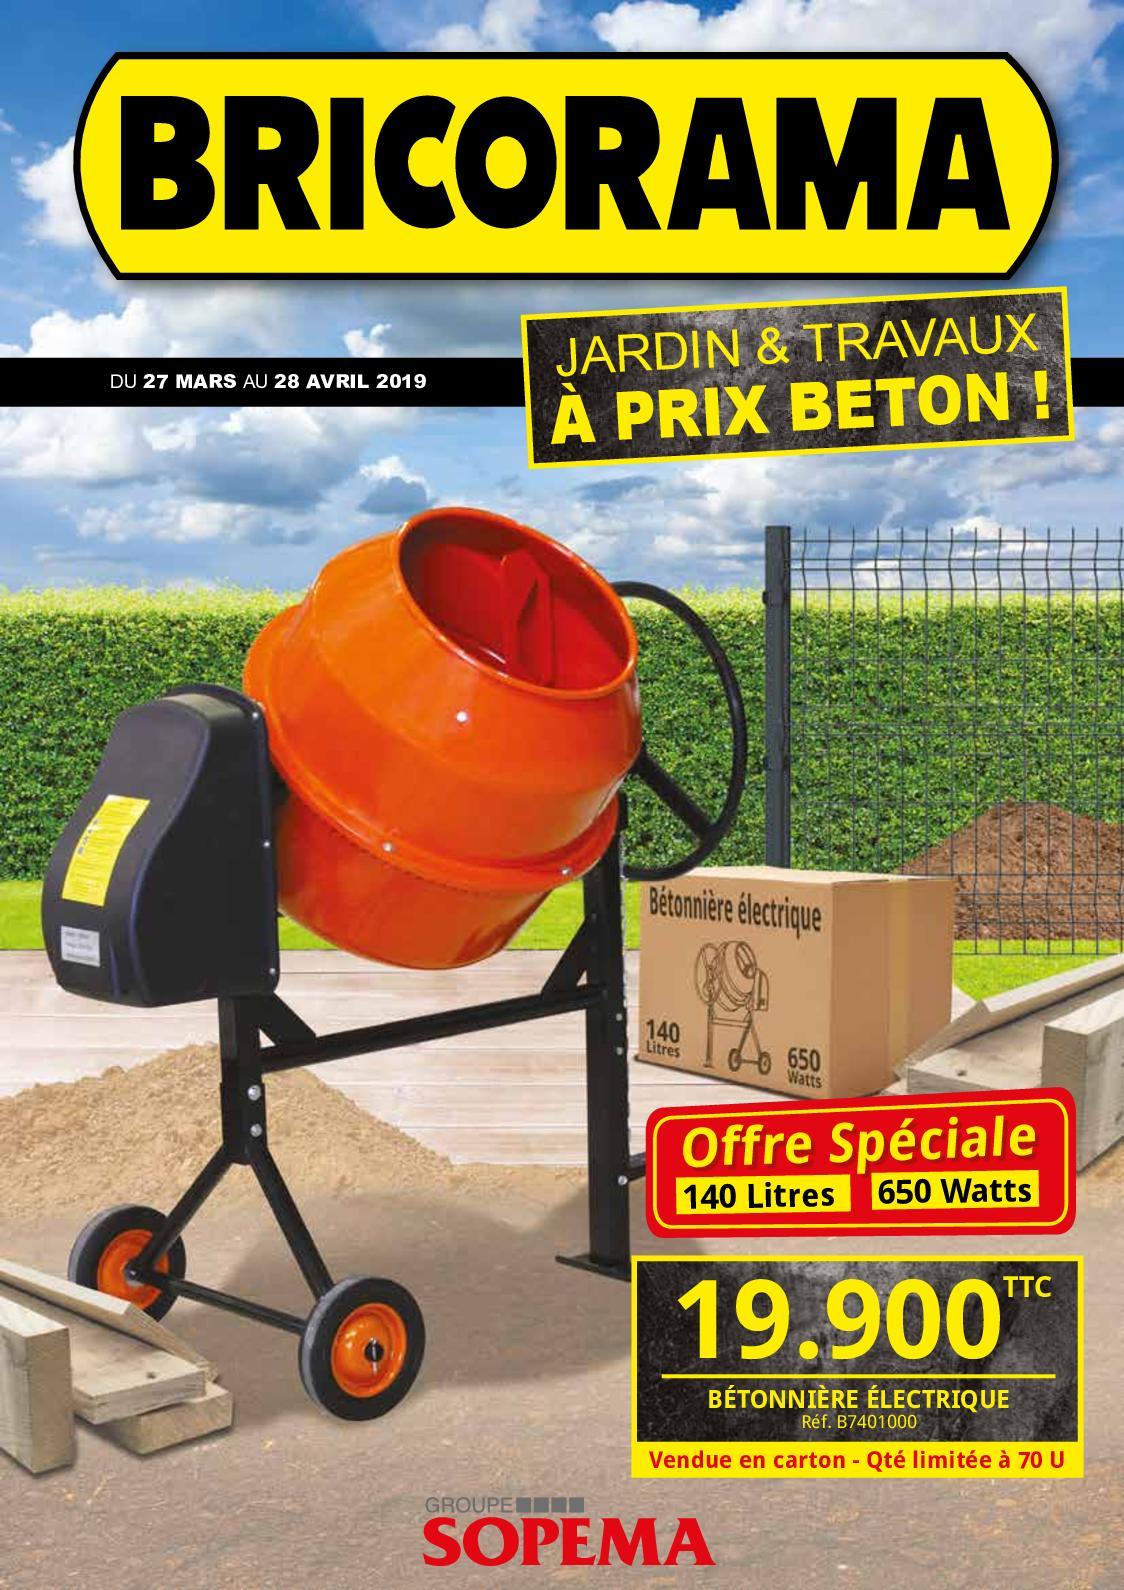 À Jardin Calaméo Travaux Prix Béton Bricorama j4LqAc5R3S